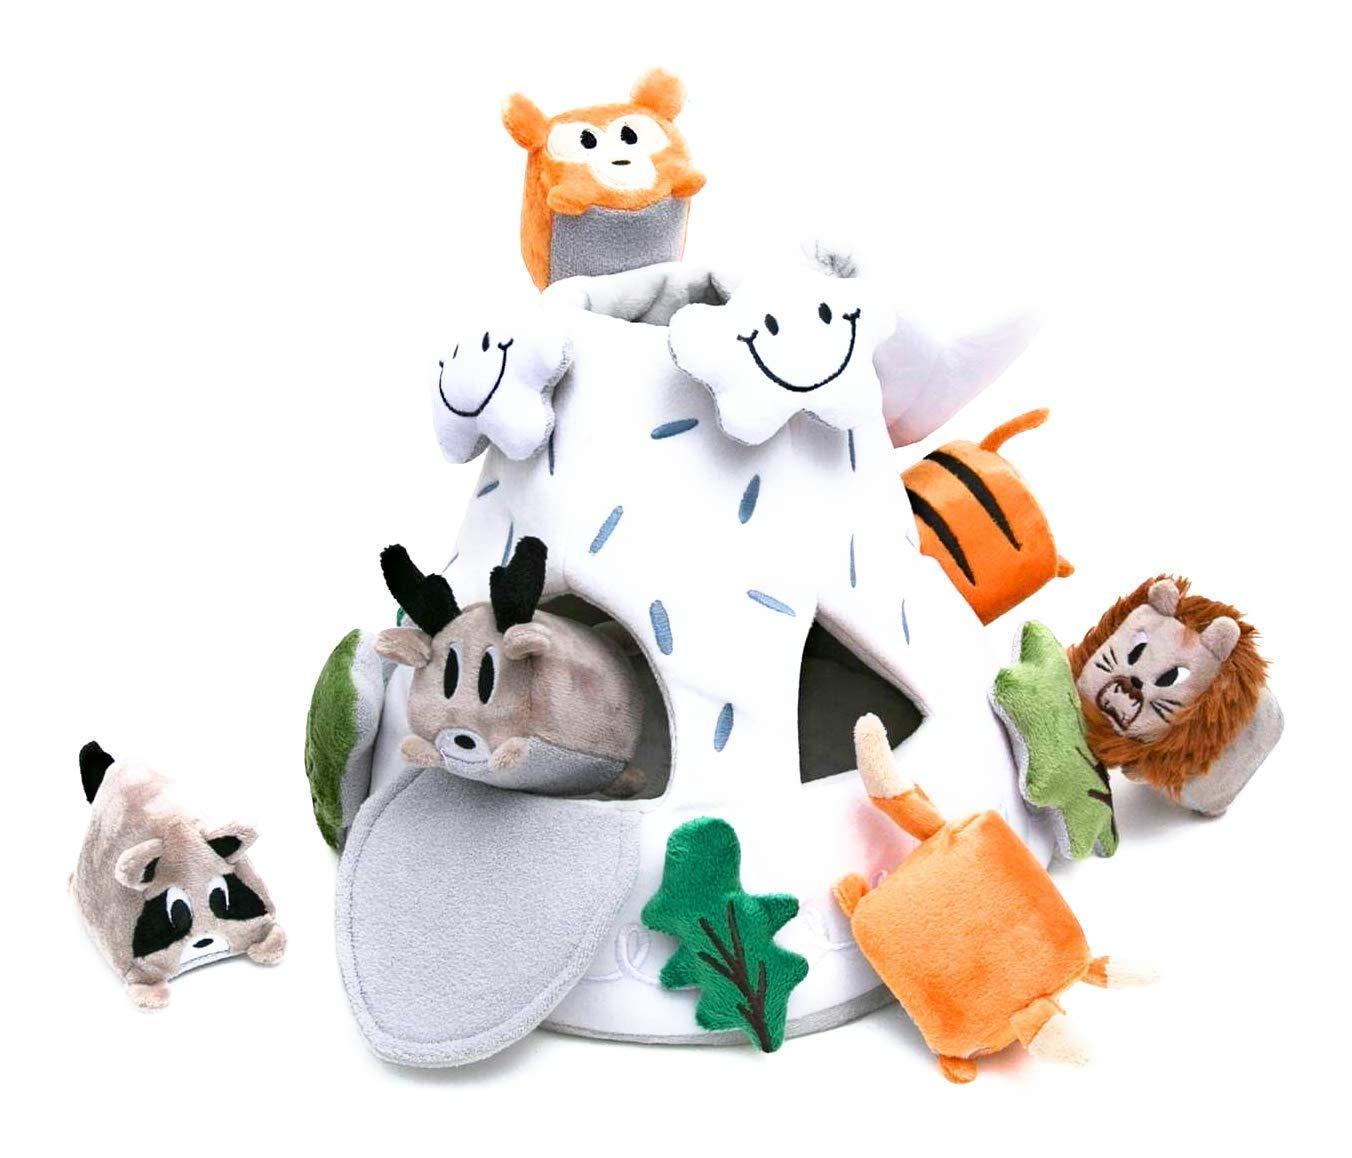 "OK!DZO 12"" Mountain & Animal Shape Sorter Plush Developmental Toy Set (16 pcs) - Cognitive & Motor & Social Skills - Fun Bright Colors & Textures for Babies 0-36 Months"